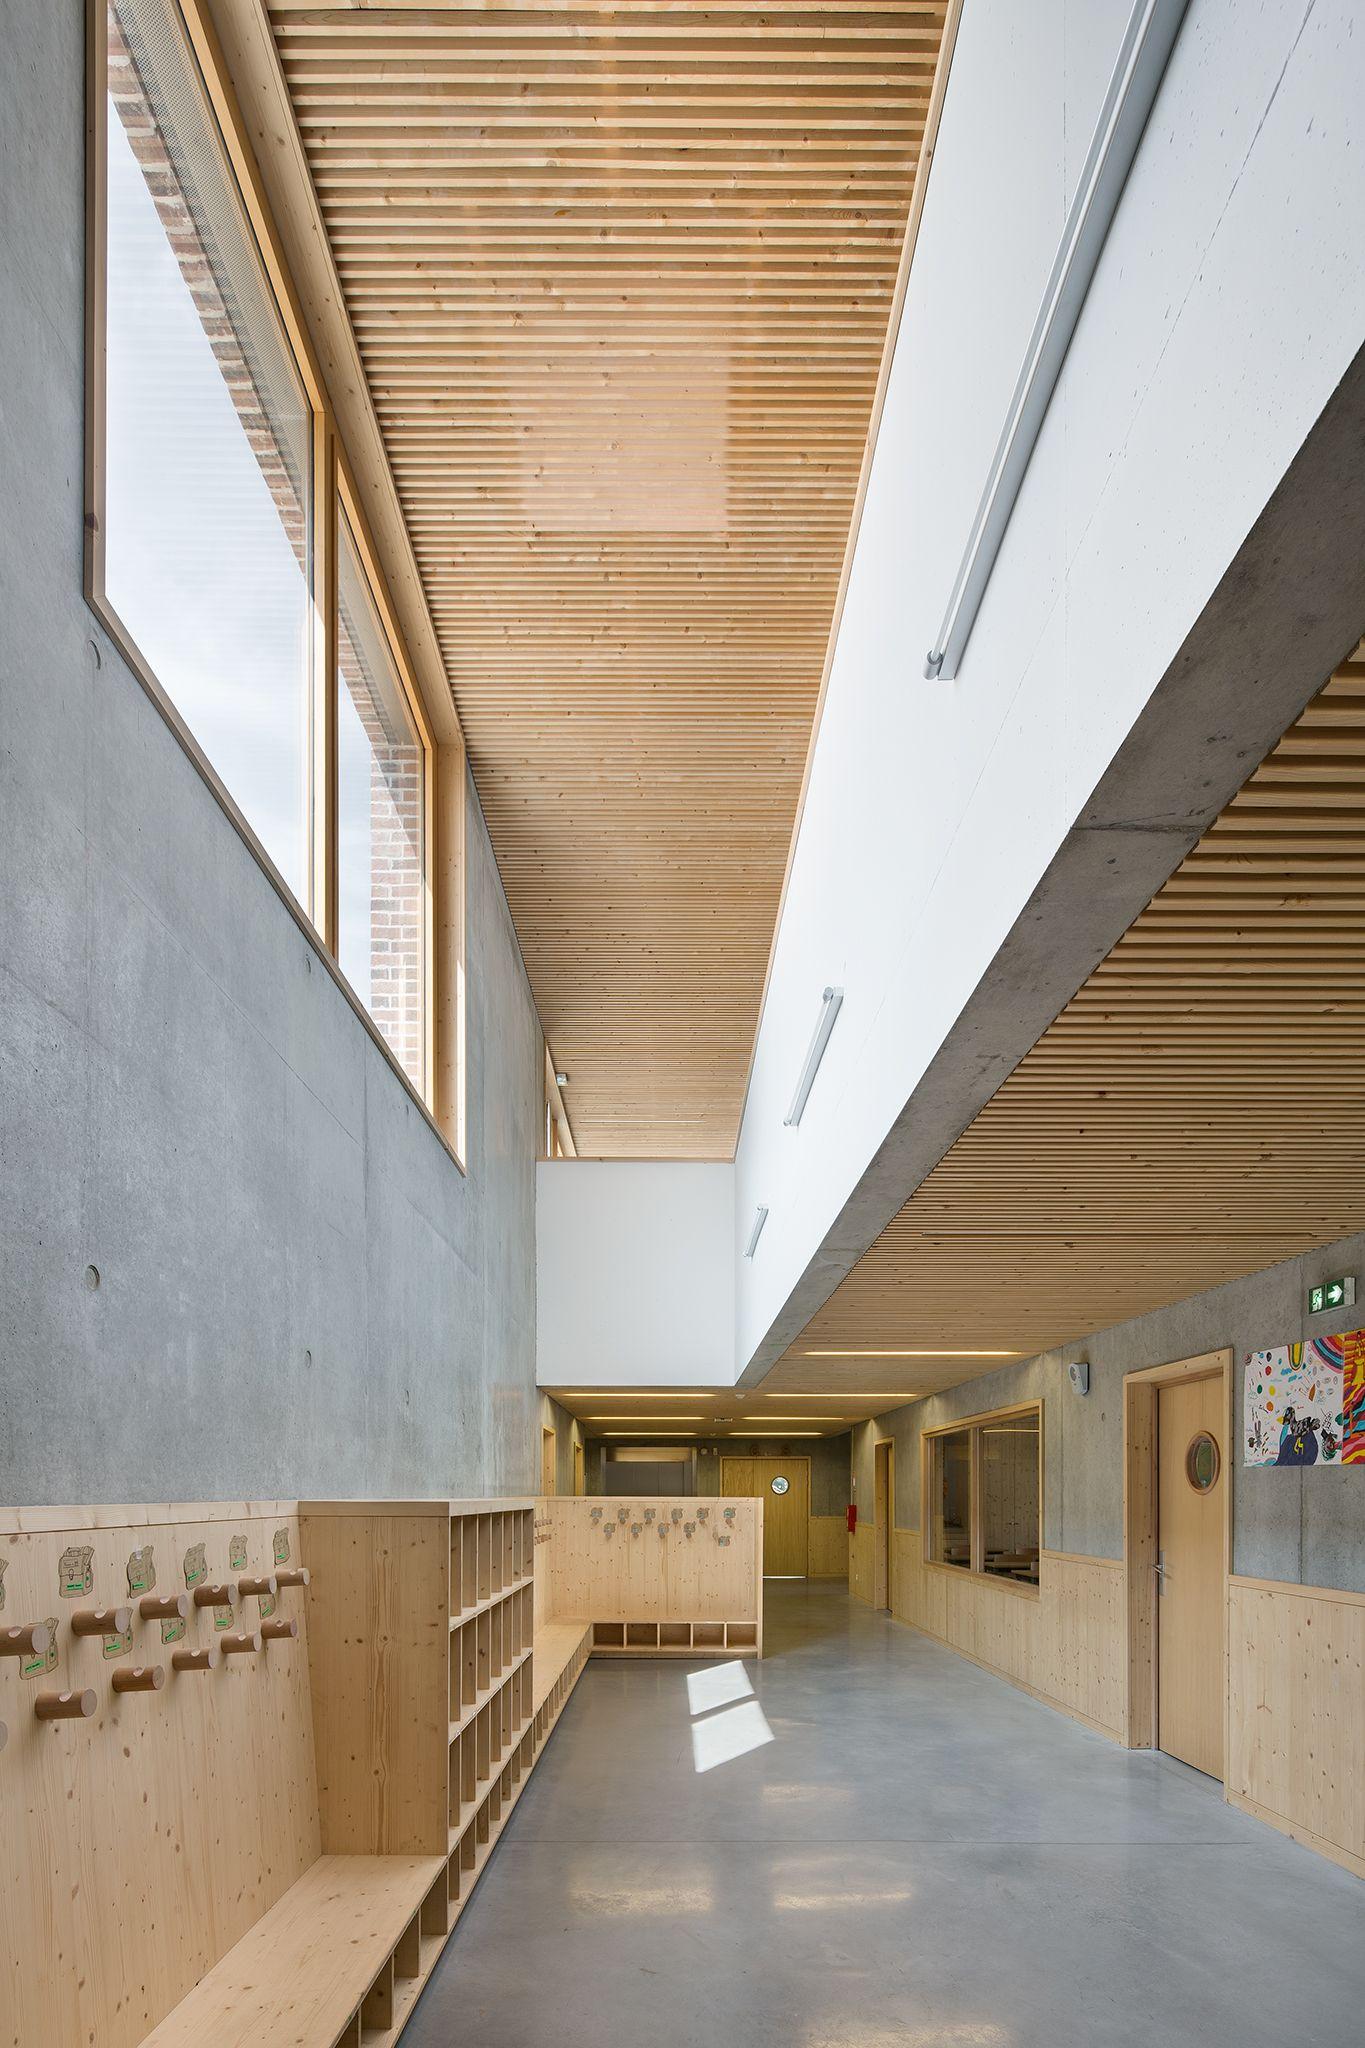 Ecole primaire pontailler sur sa ne s p a c e s i - Interior design for school buildings ...